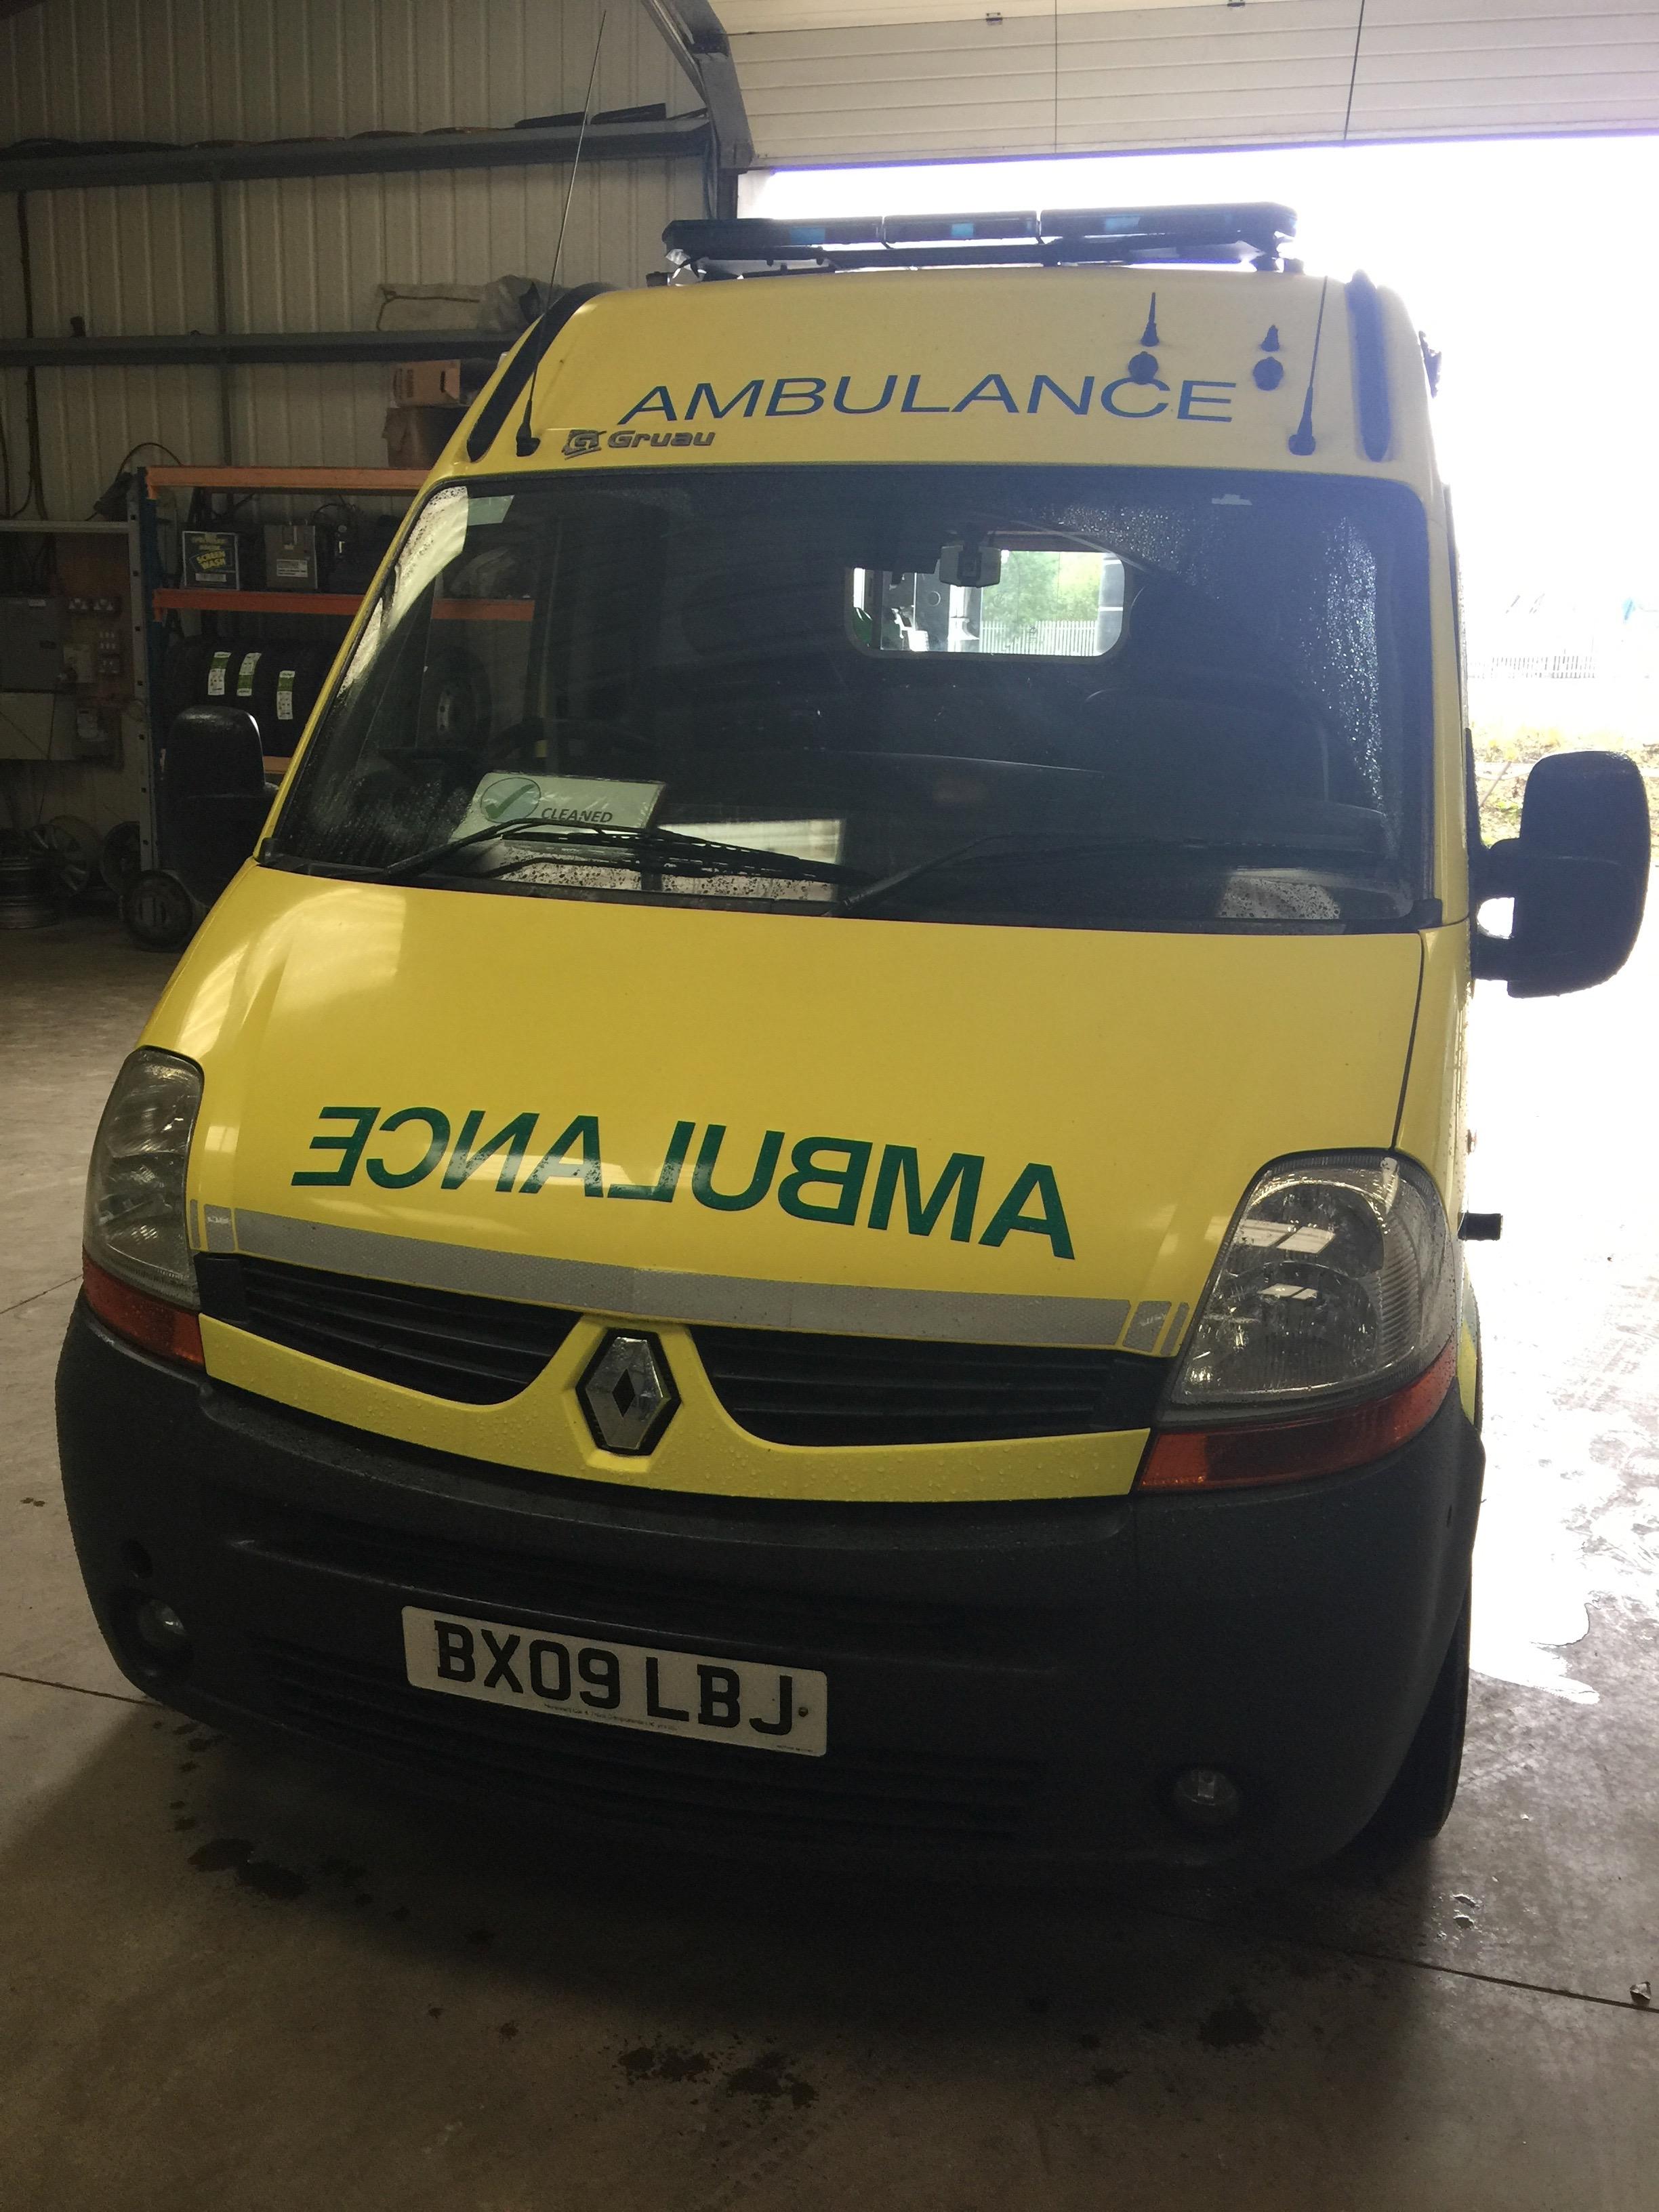 Lot 1 - Renault Master standard body HDU ambulance Registration No BX09 LBJ, 322494 recorded miles, date